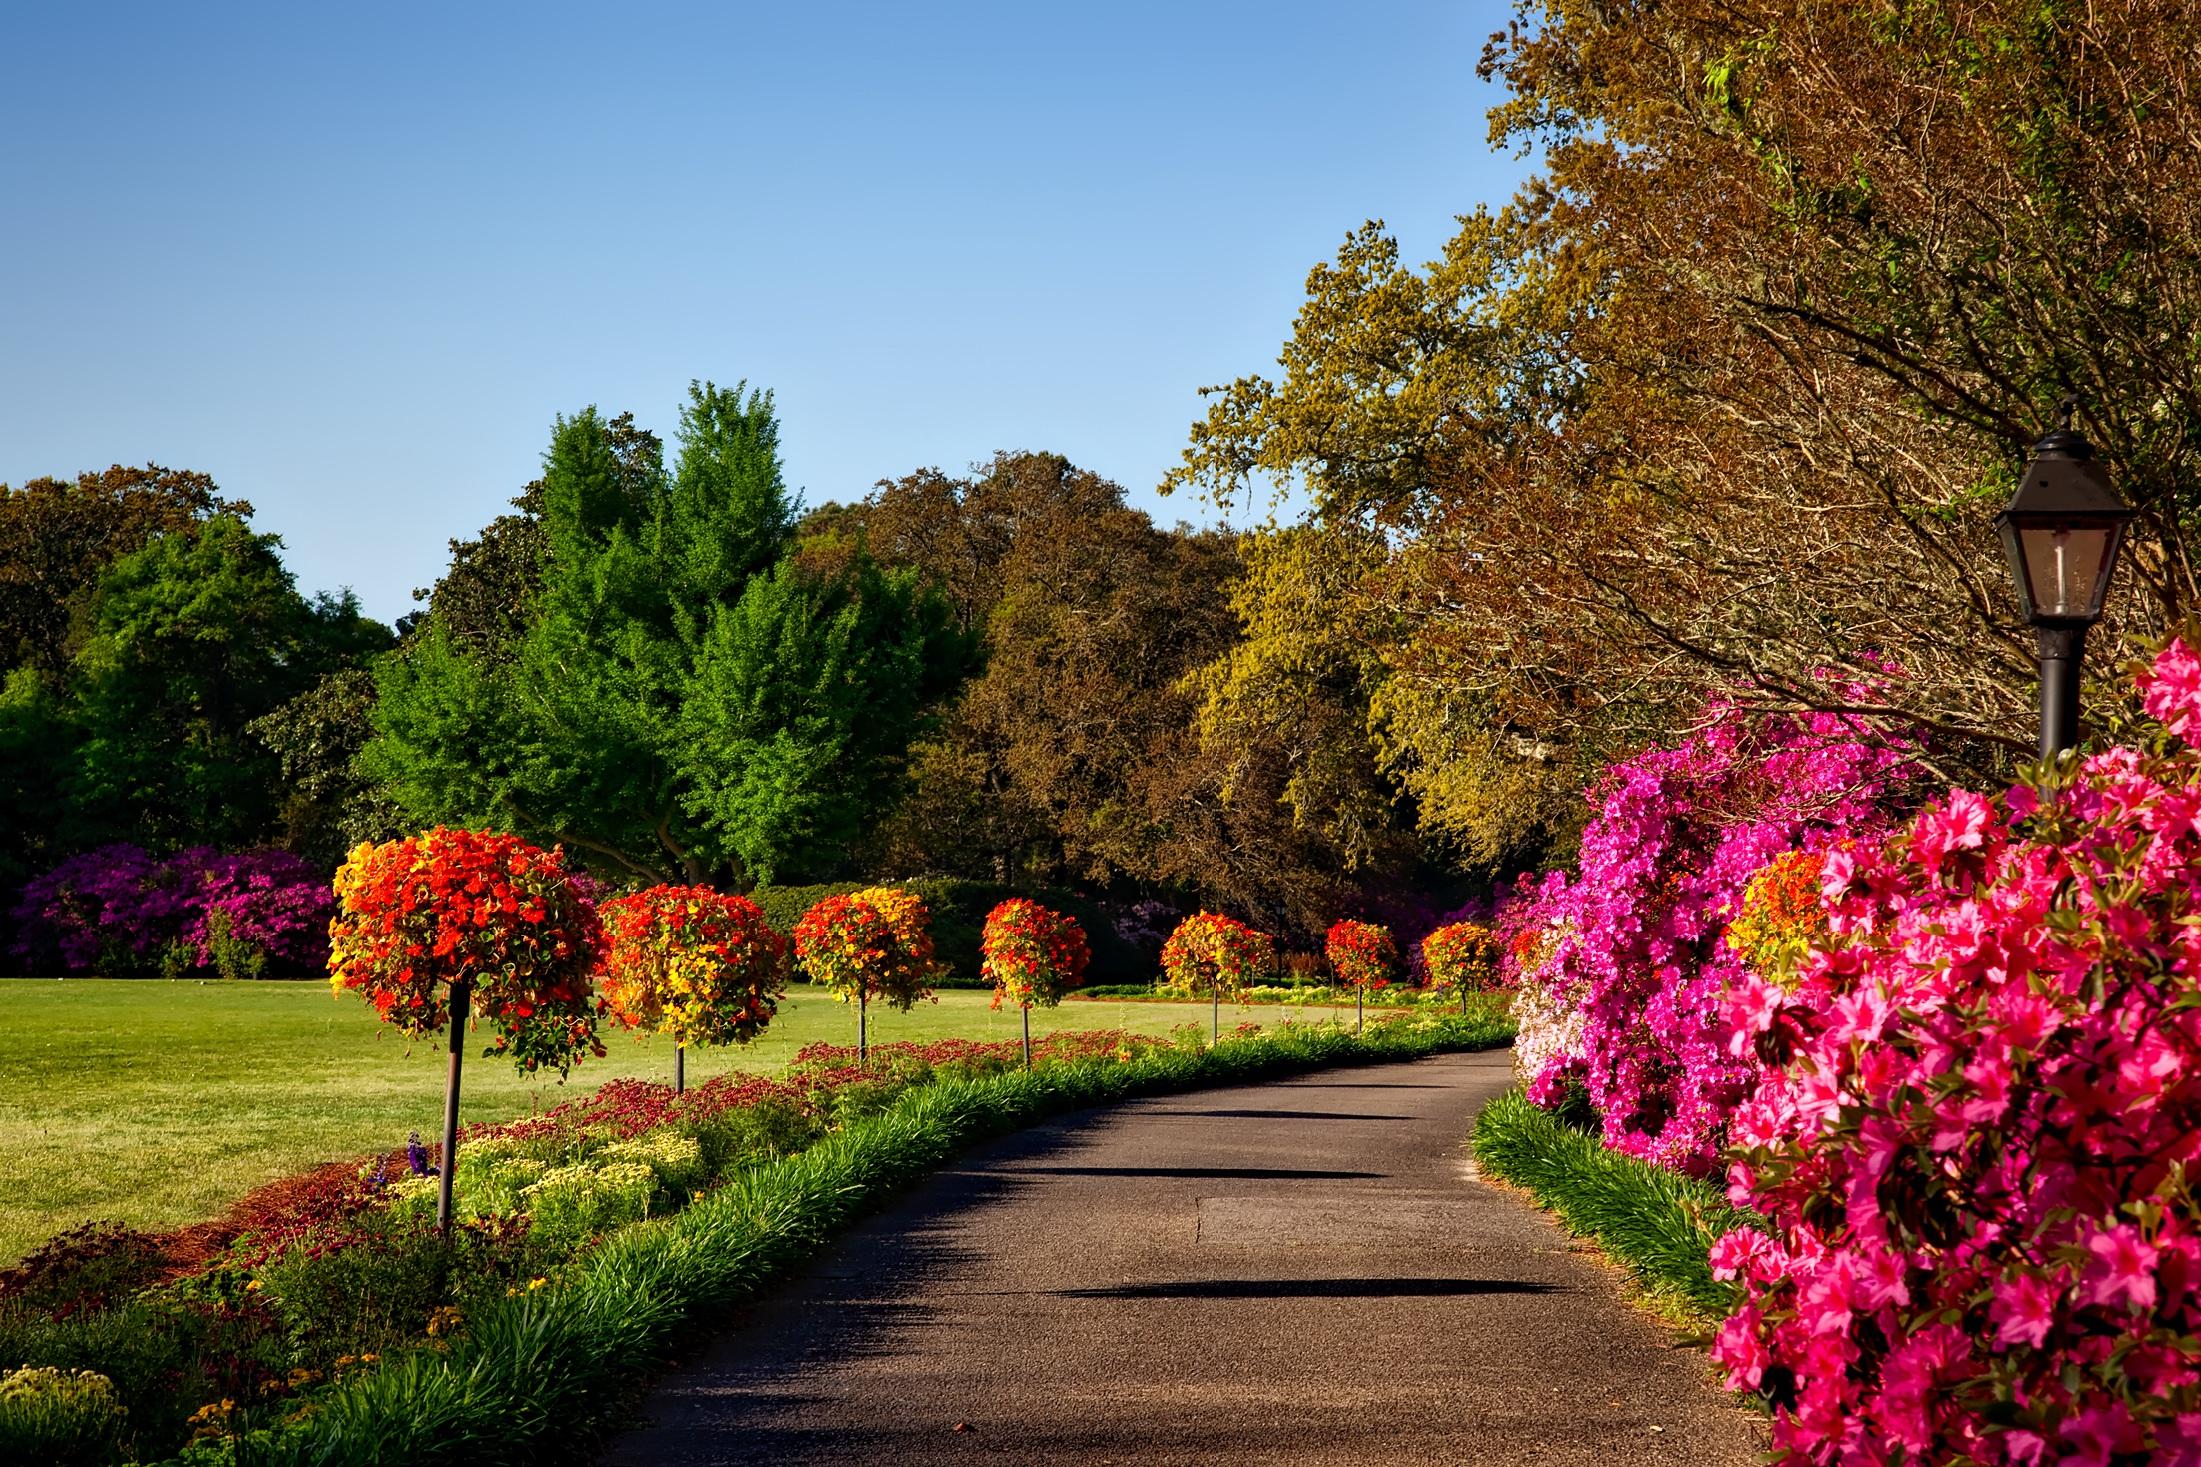 Free photo: Garden - nature, freshness, fresh - Creative Commons ...